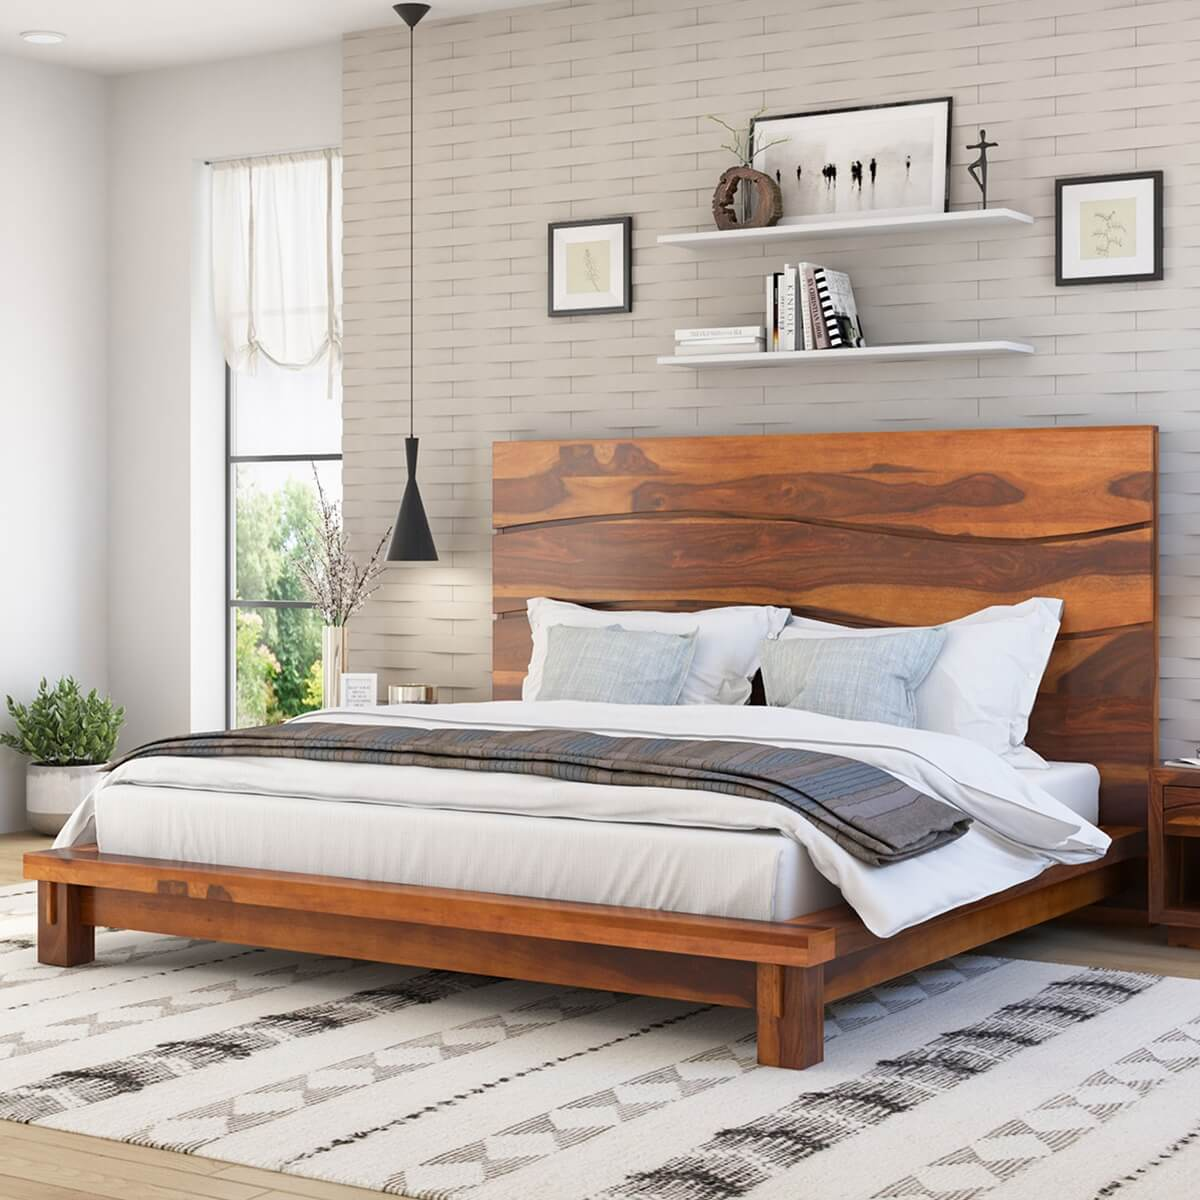 Picture of: Santa Barbara Solid Wood High Headboard Platform Bed